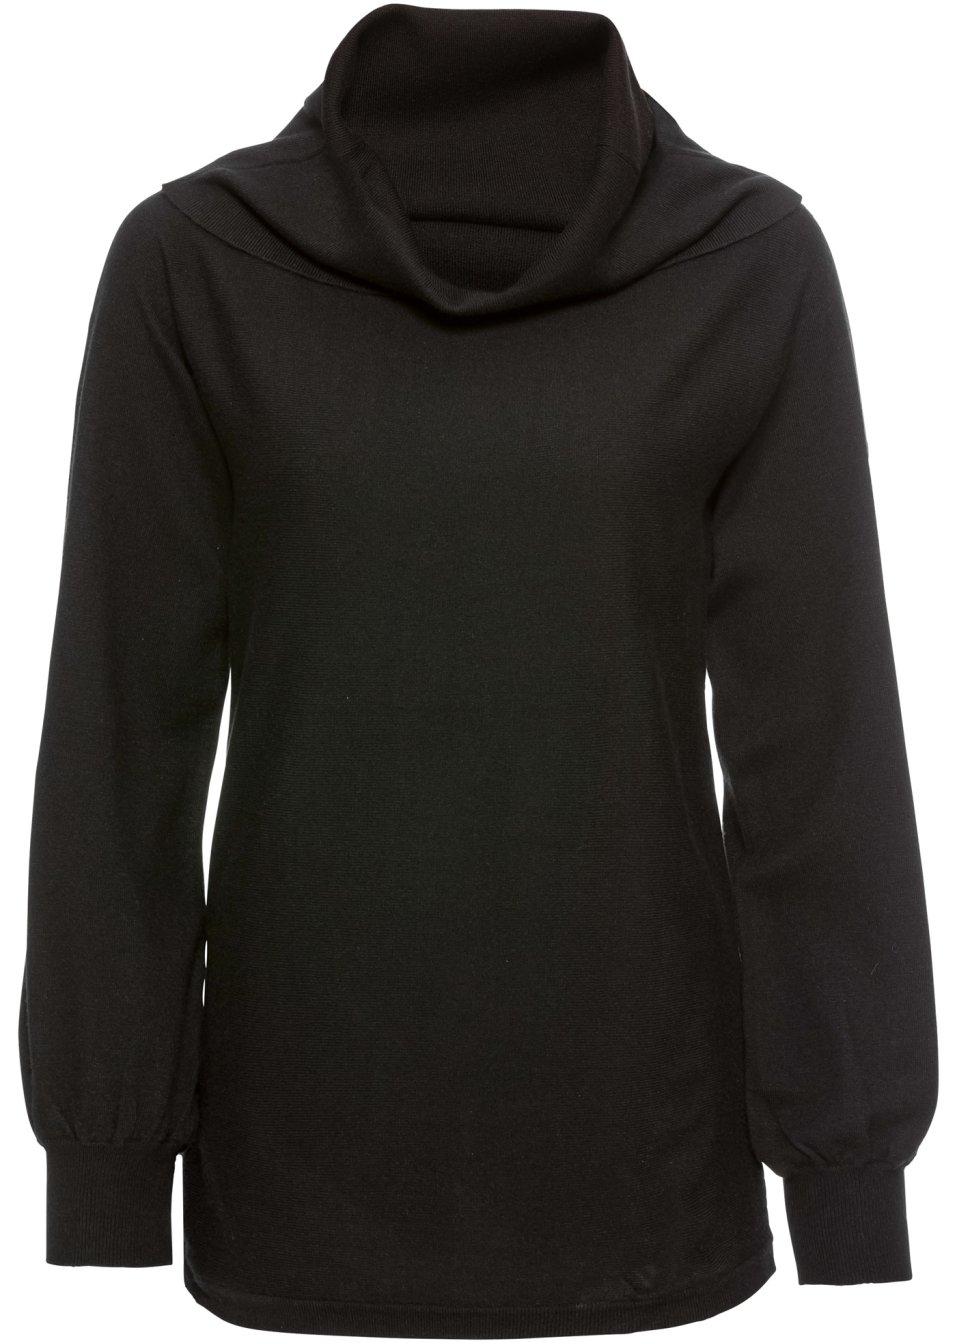 femininer pullover mit rollkragen schwarz. Black Bedroom Furniture Sets. Home Design Ideas